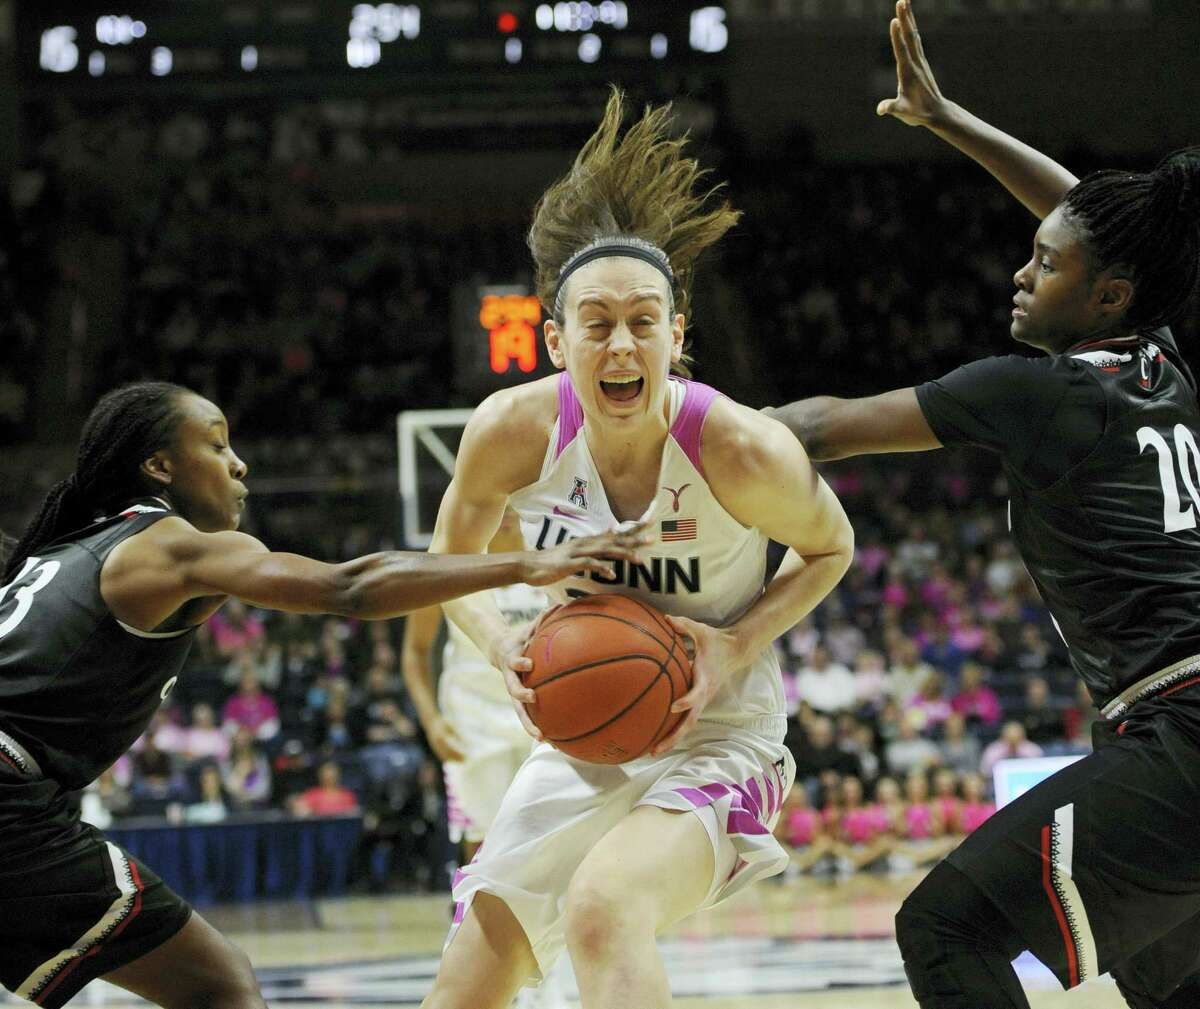 UConn's Breanna Stewart drives to the basket against Cincinnati on Wednesday.